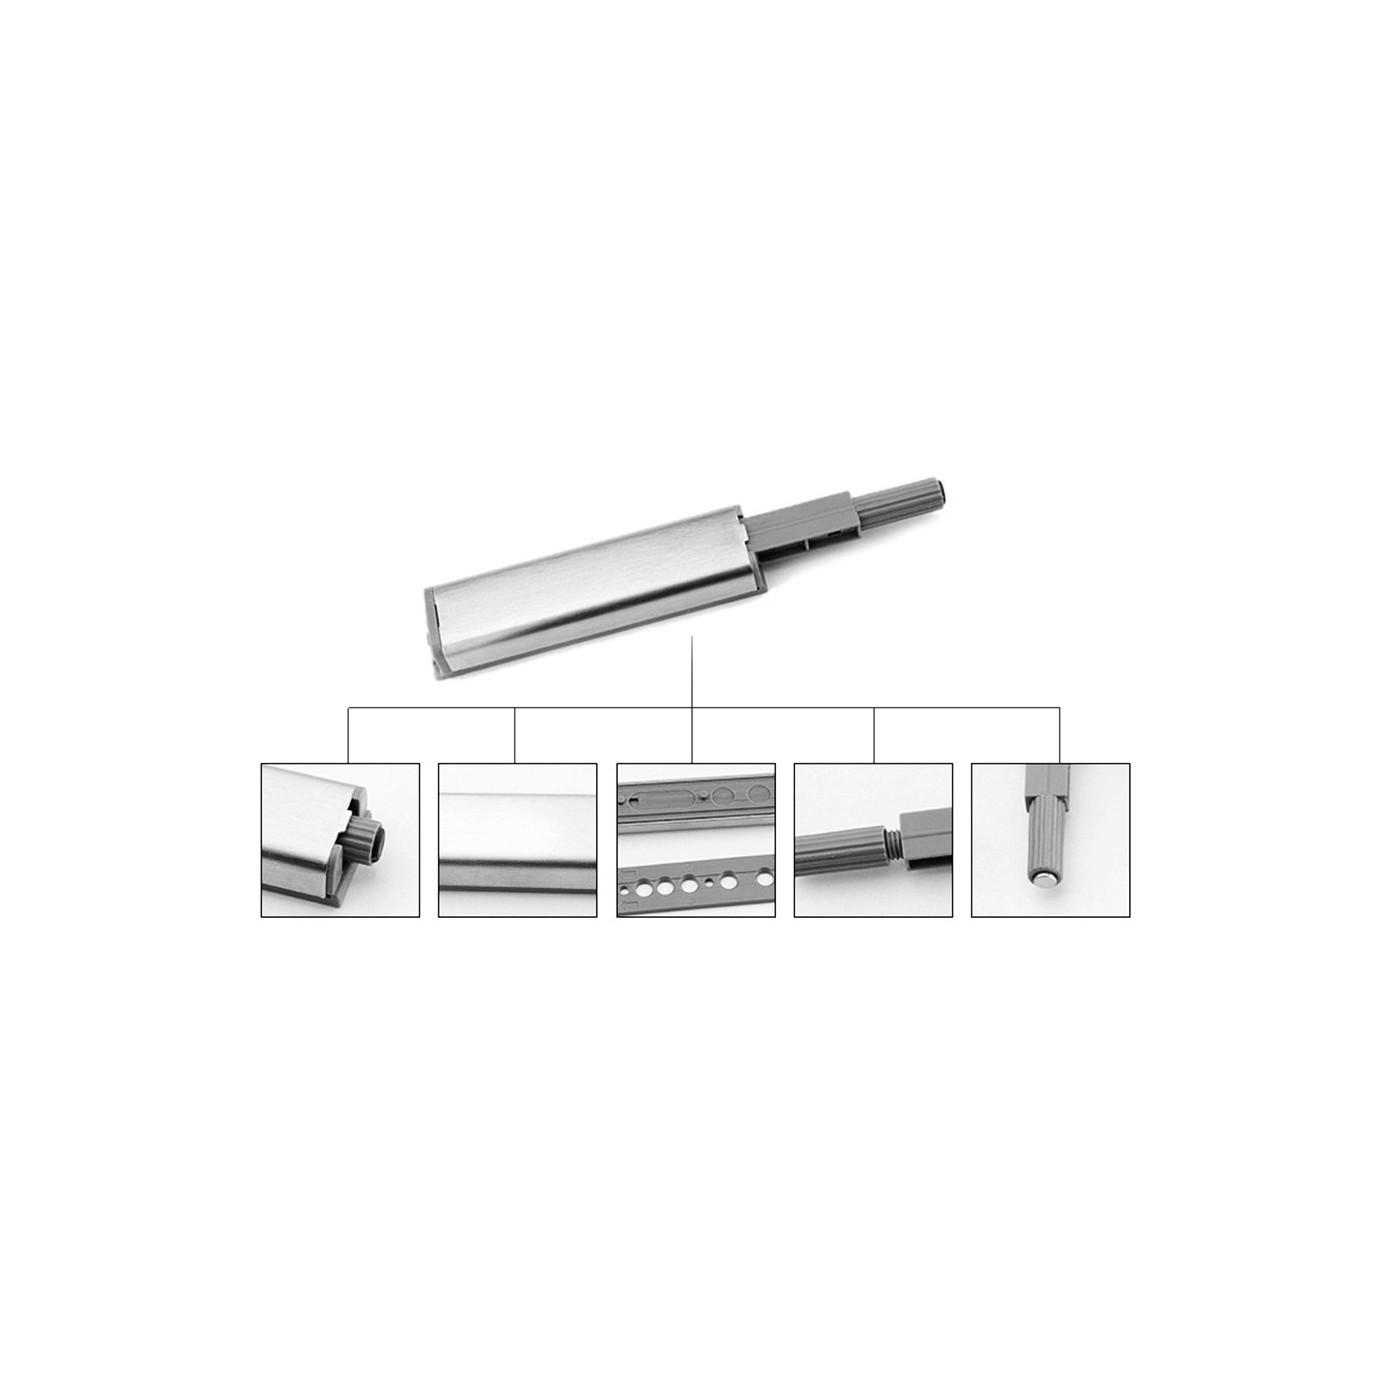 Set di 12 snapper magnetici push-to-open per ante di armadi